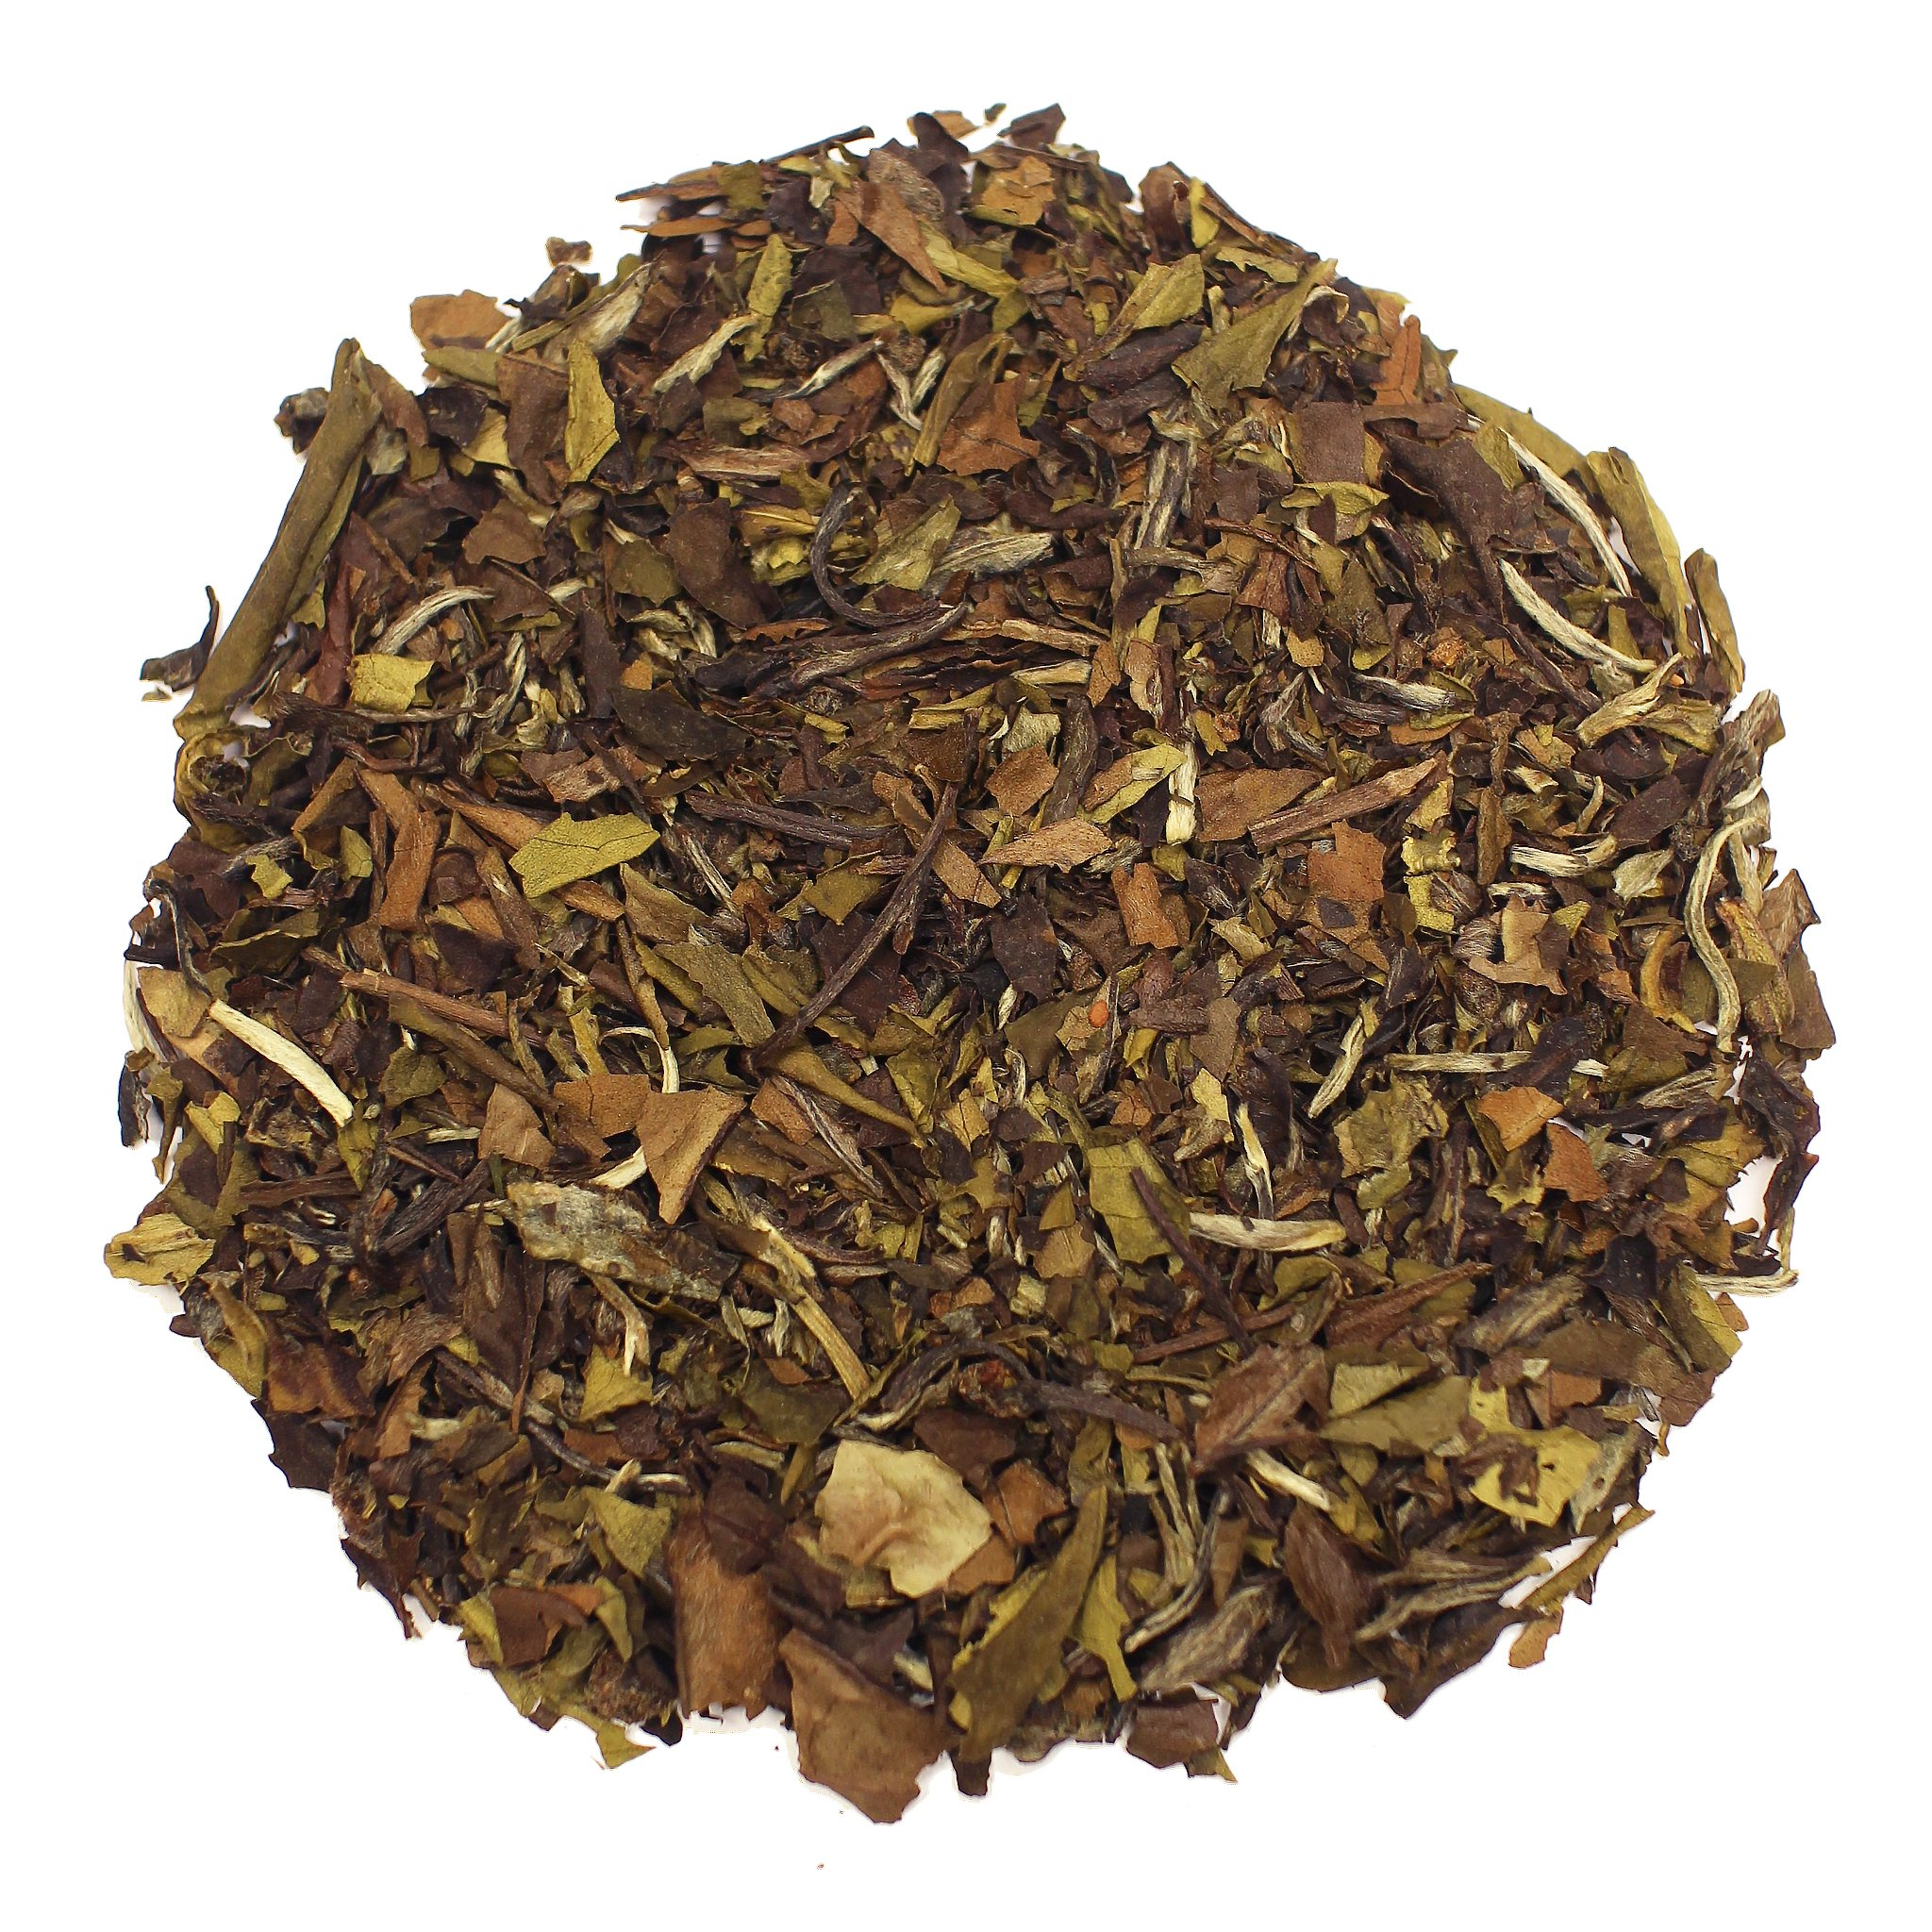 The Tea Farm - Blueberry White Fruit Tea - Loose Leaf White Tea (8 Ounce Bag) by The Tea Farm